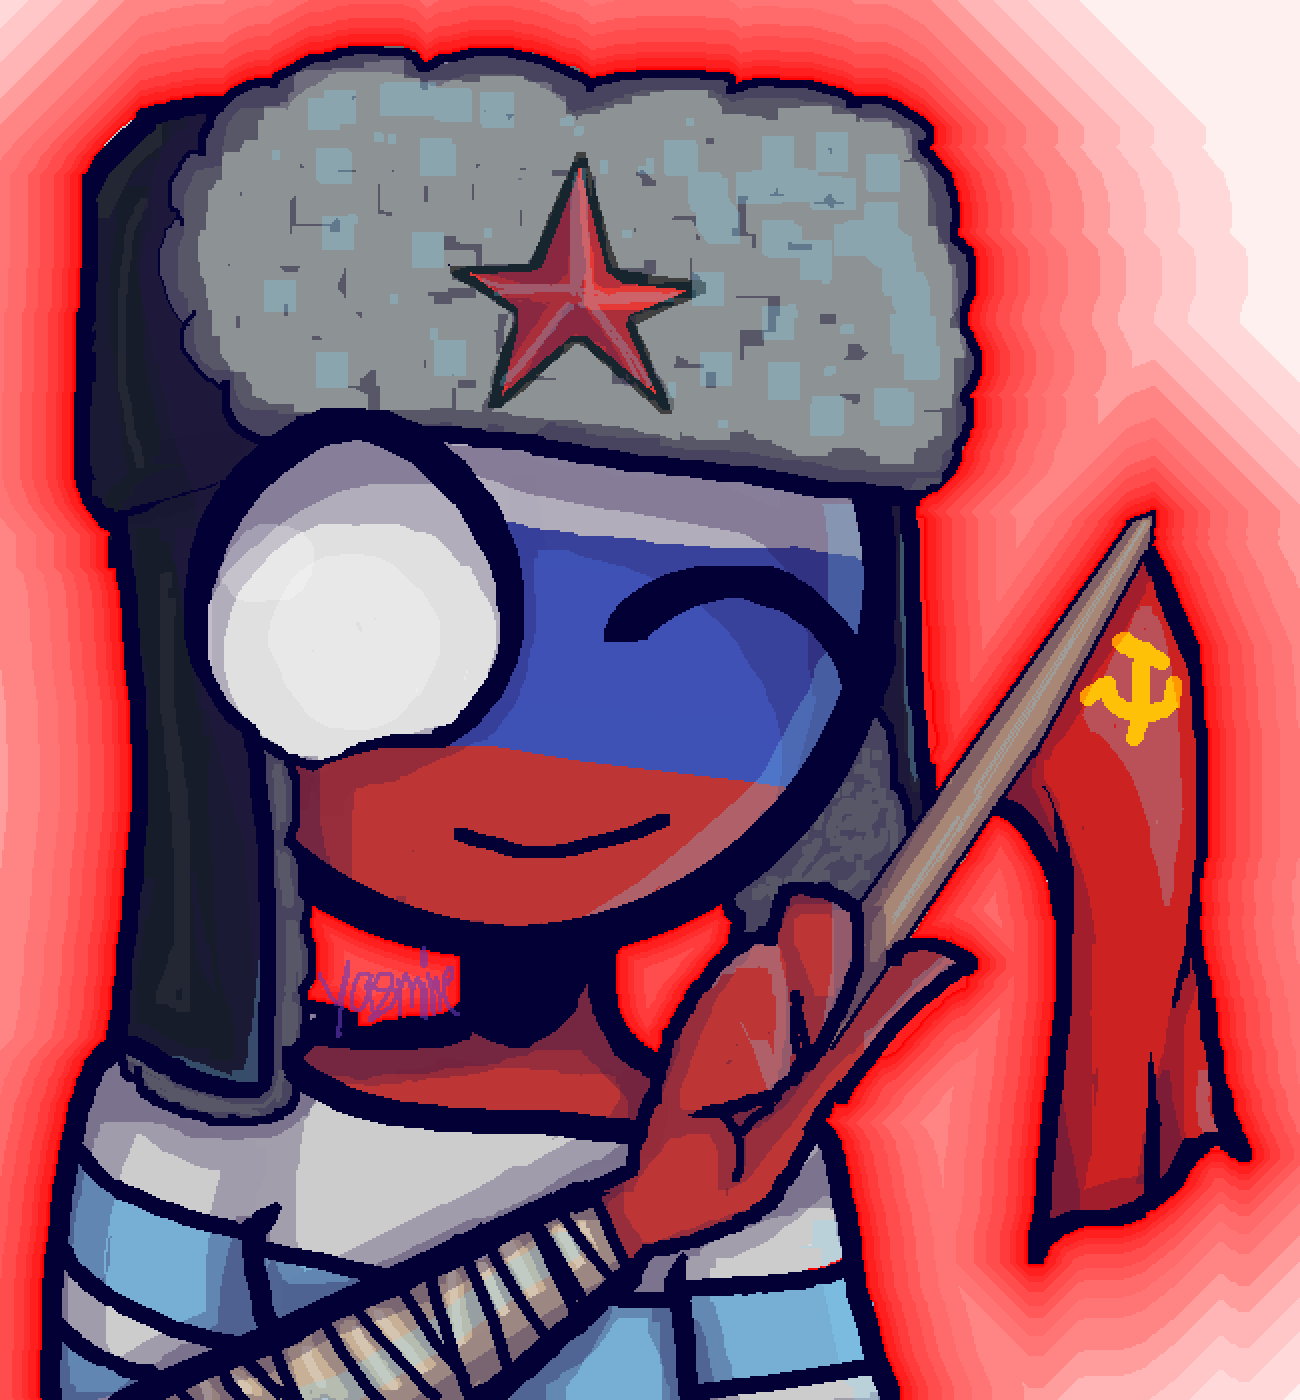 Russia-San by YasRocks